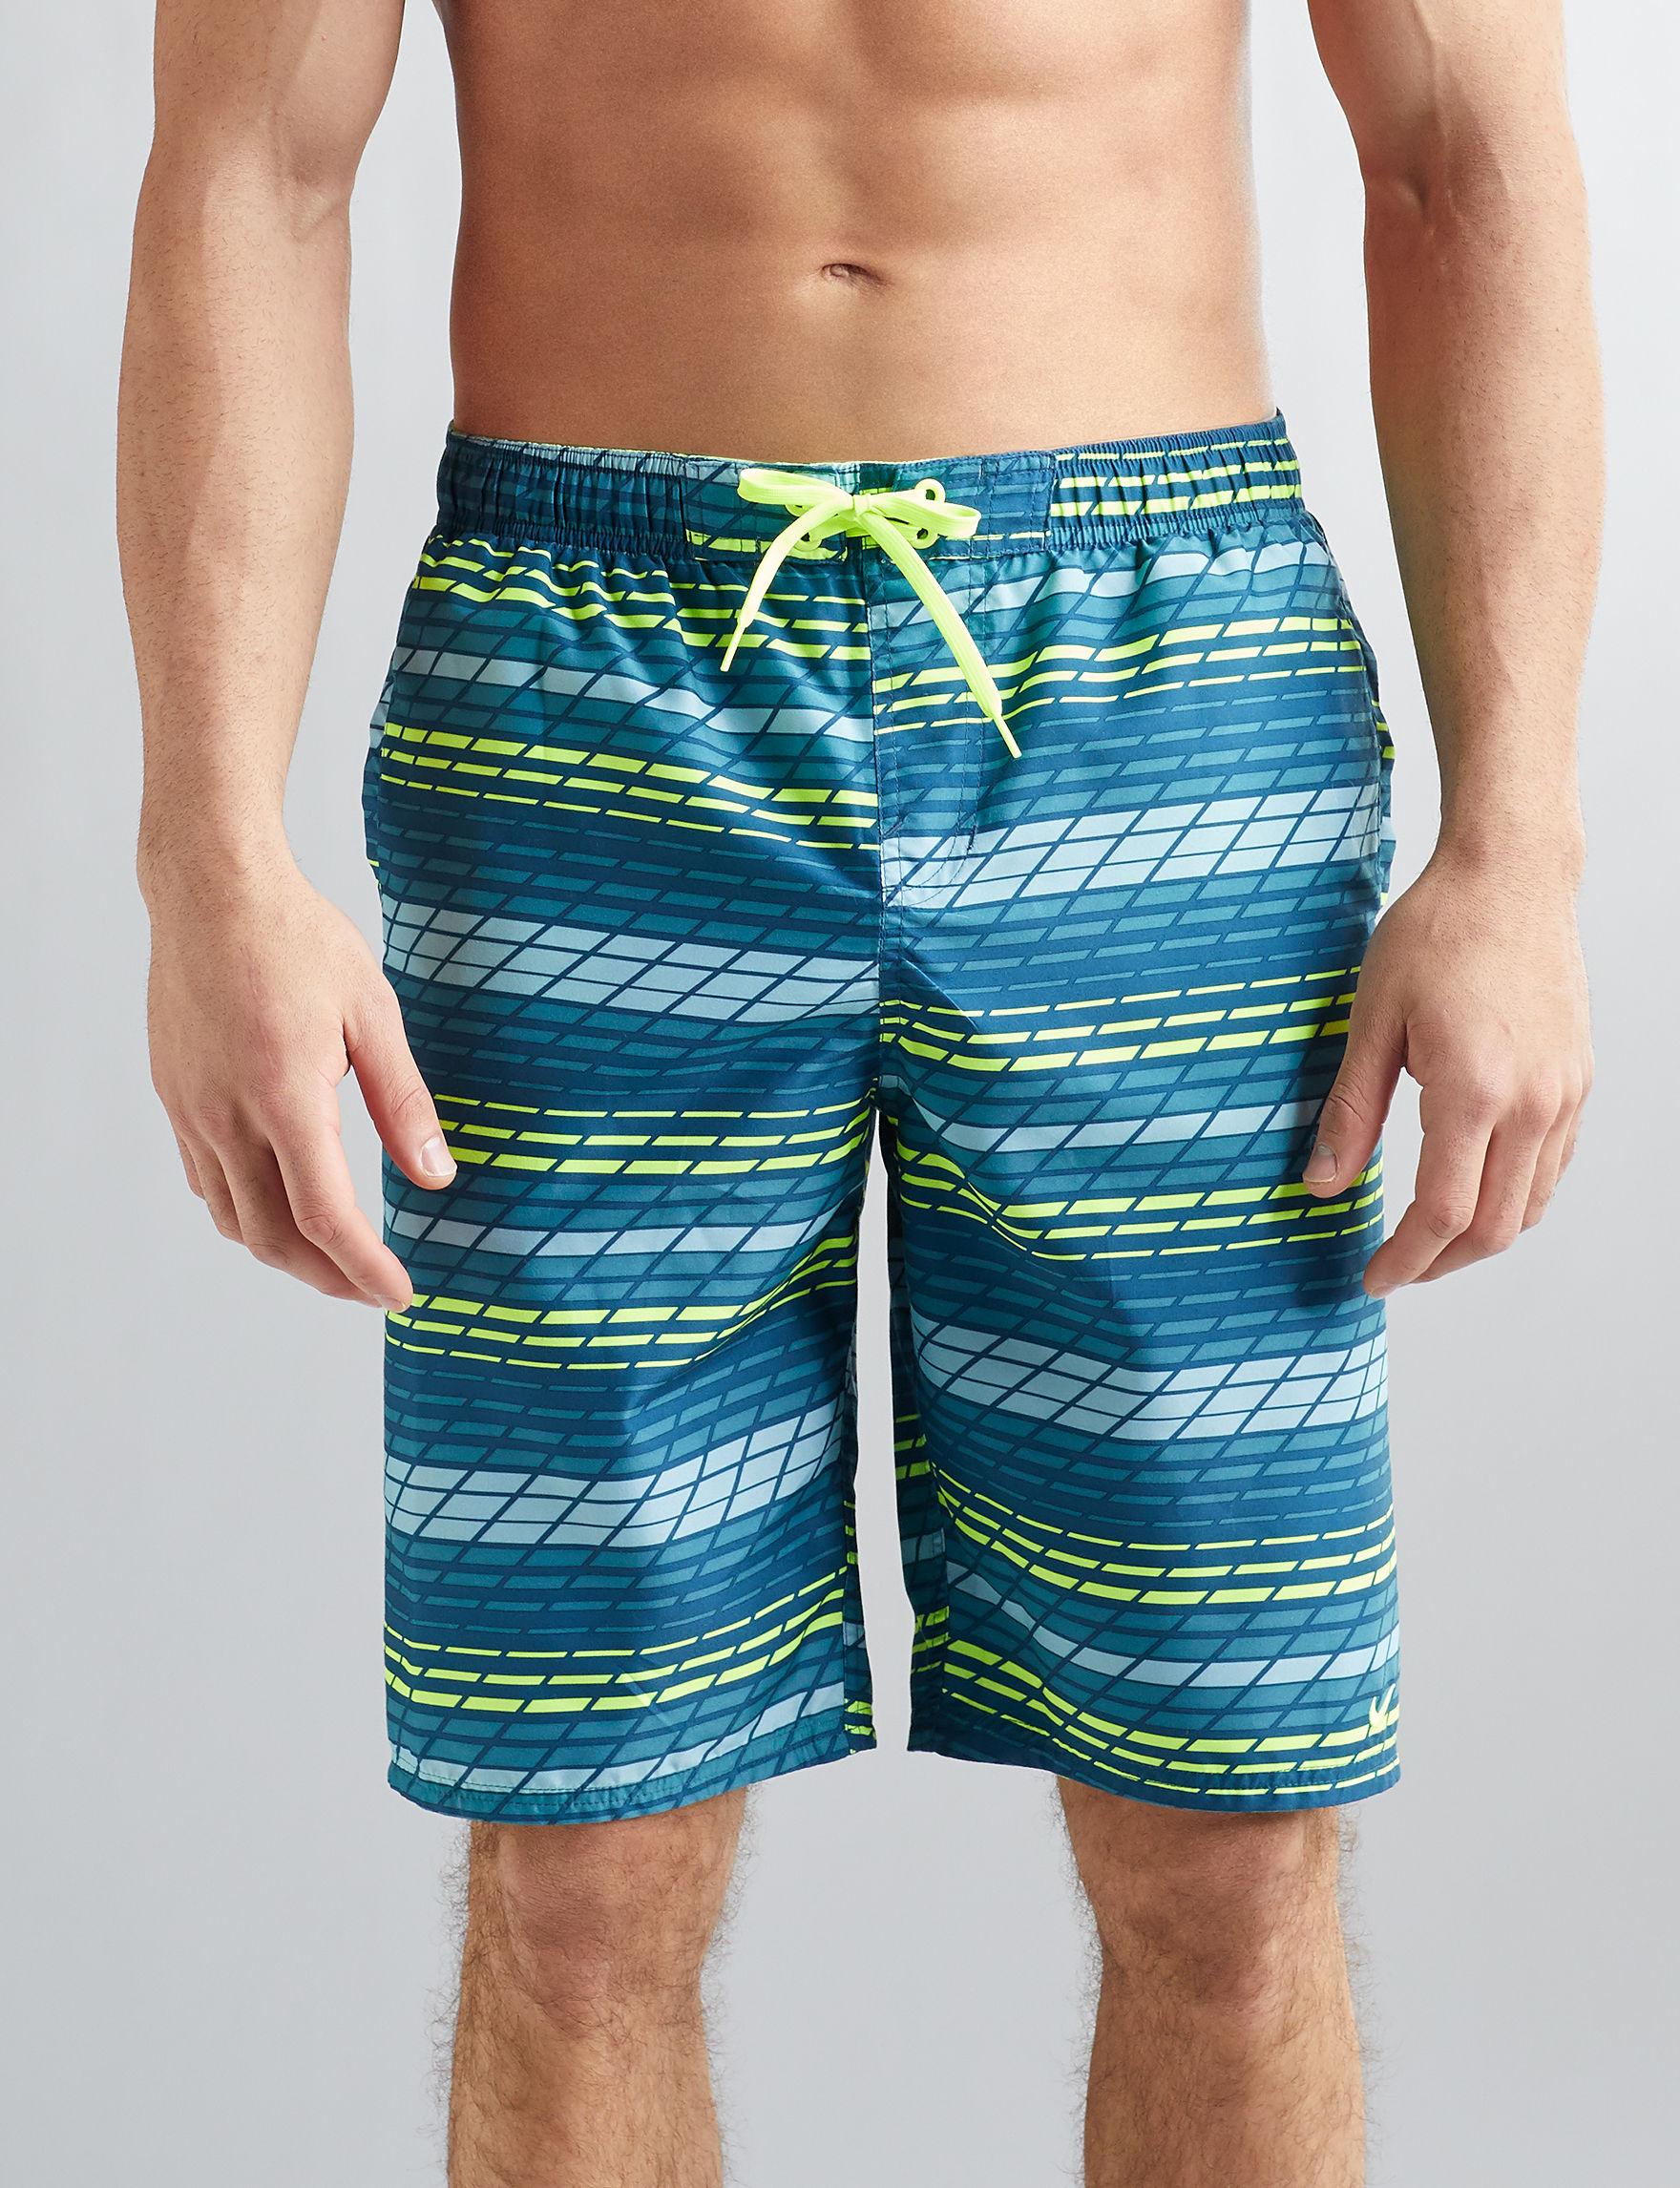 Nike Blue / Green Swimsuit Bottoms